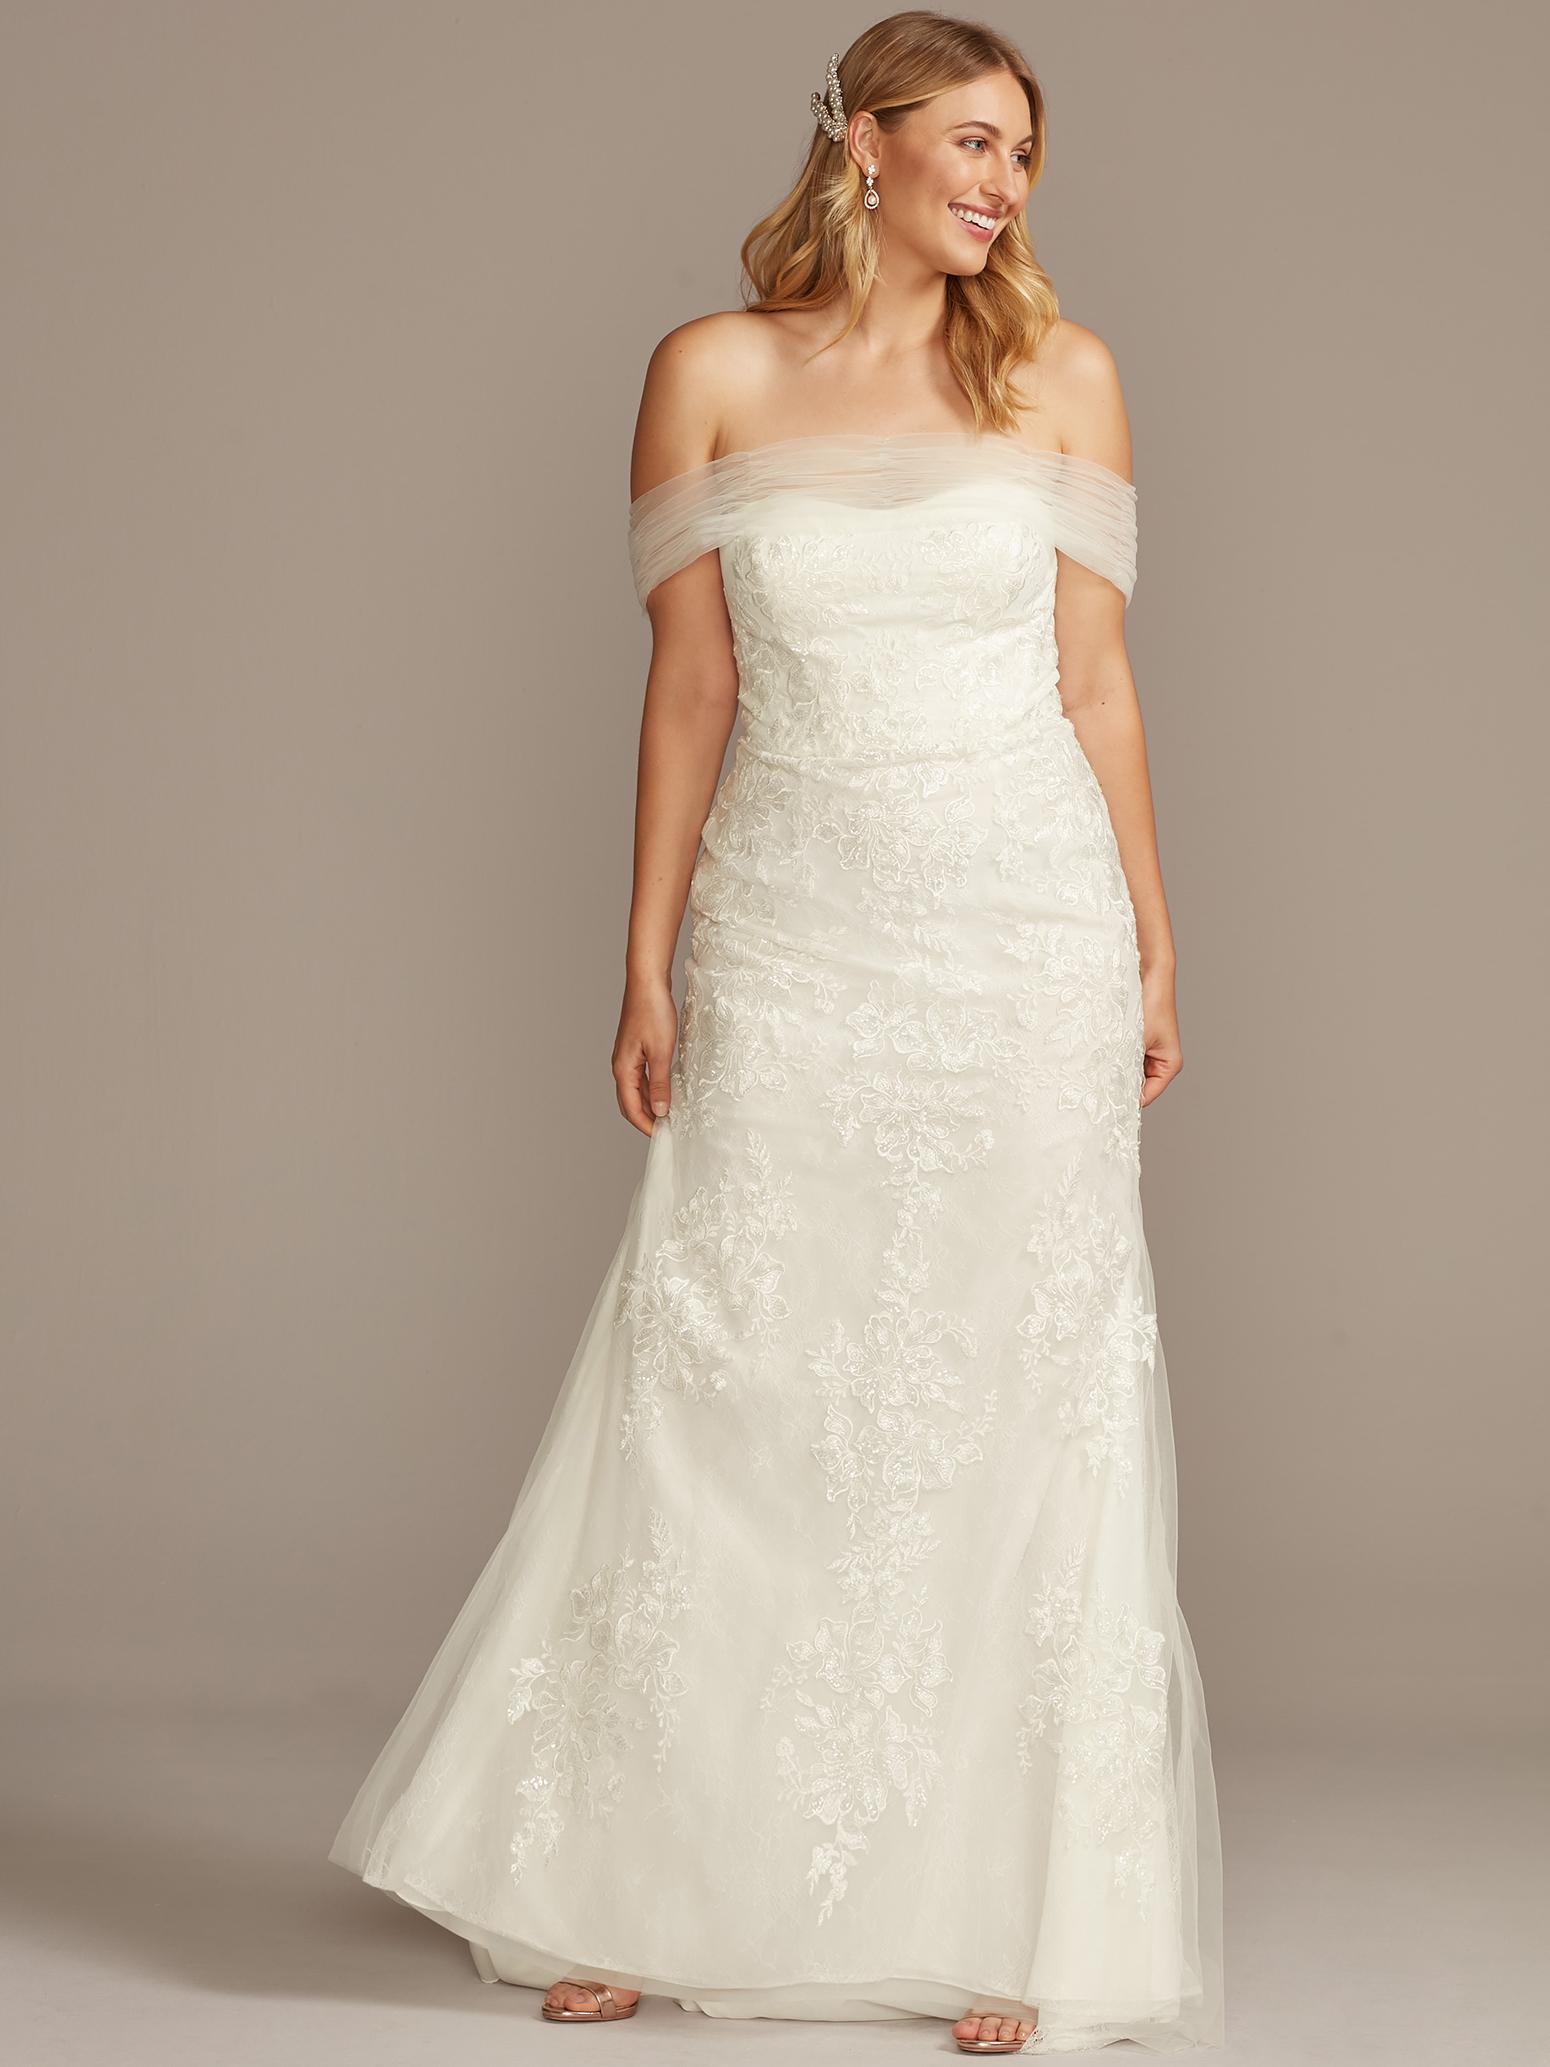 davids bridal off the shoulder tulle lace wedding dress fall 2020